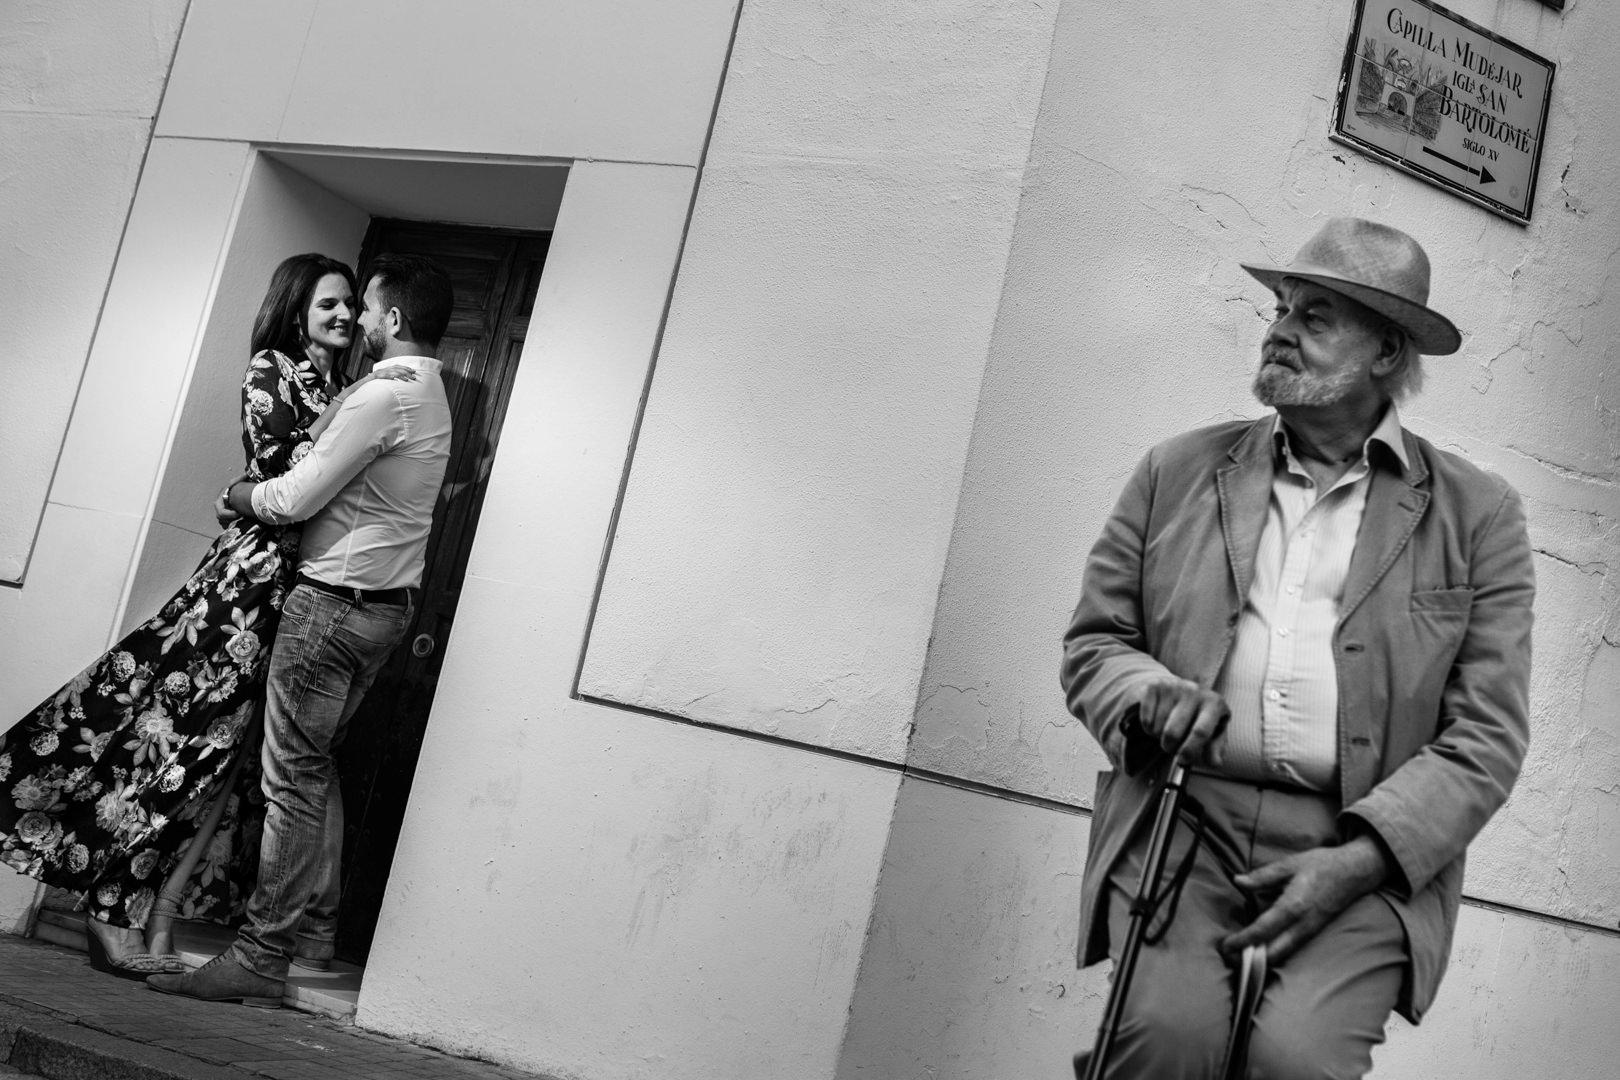 Preboda-Cordoba-Irene-Marcos-Finca-Clotidle-engagement-Rafael-Torres-fotografo-bodas-sevilla-madrid-barcelona-wedding-photographer--3.jpg